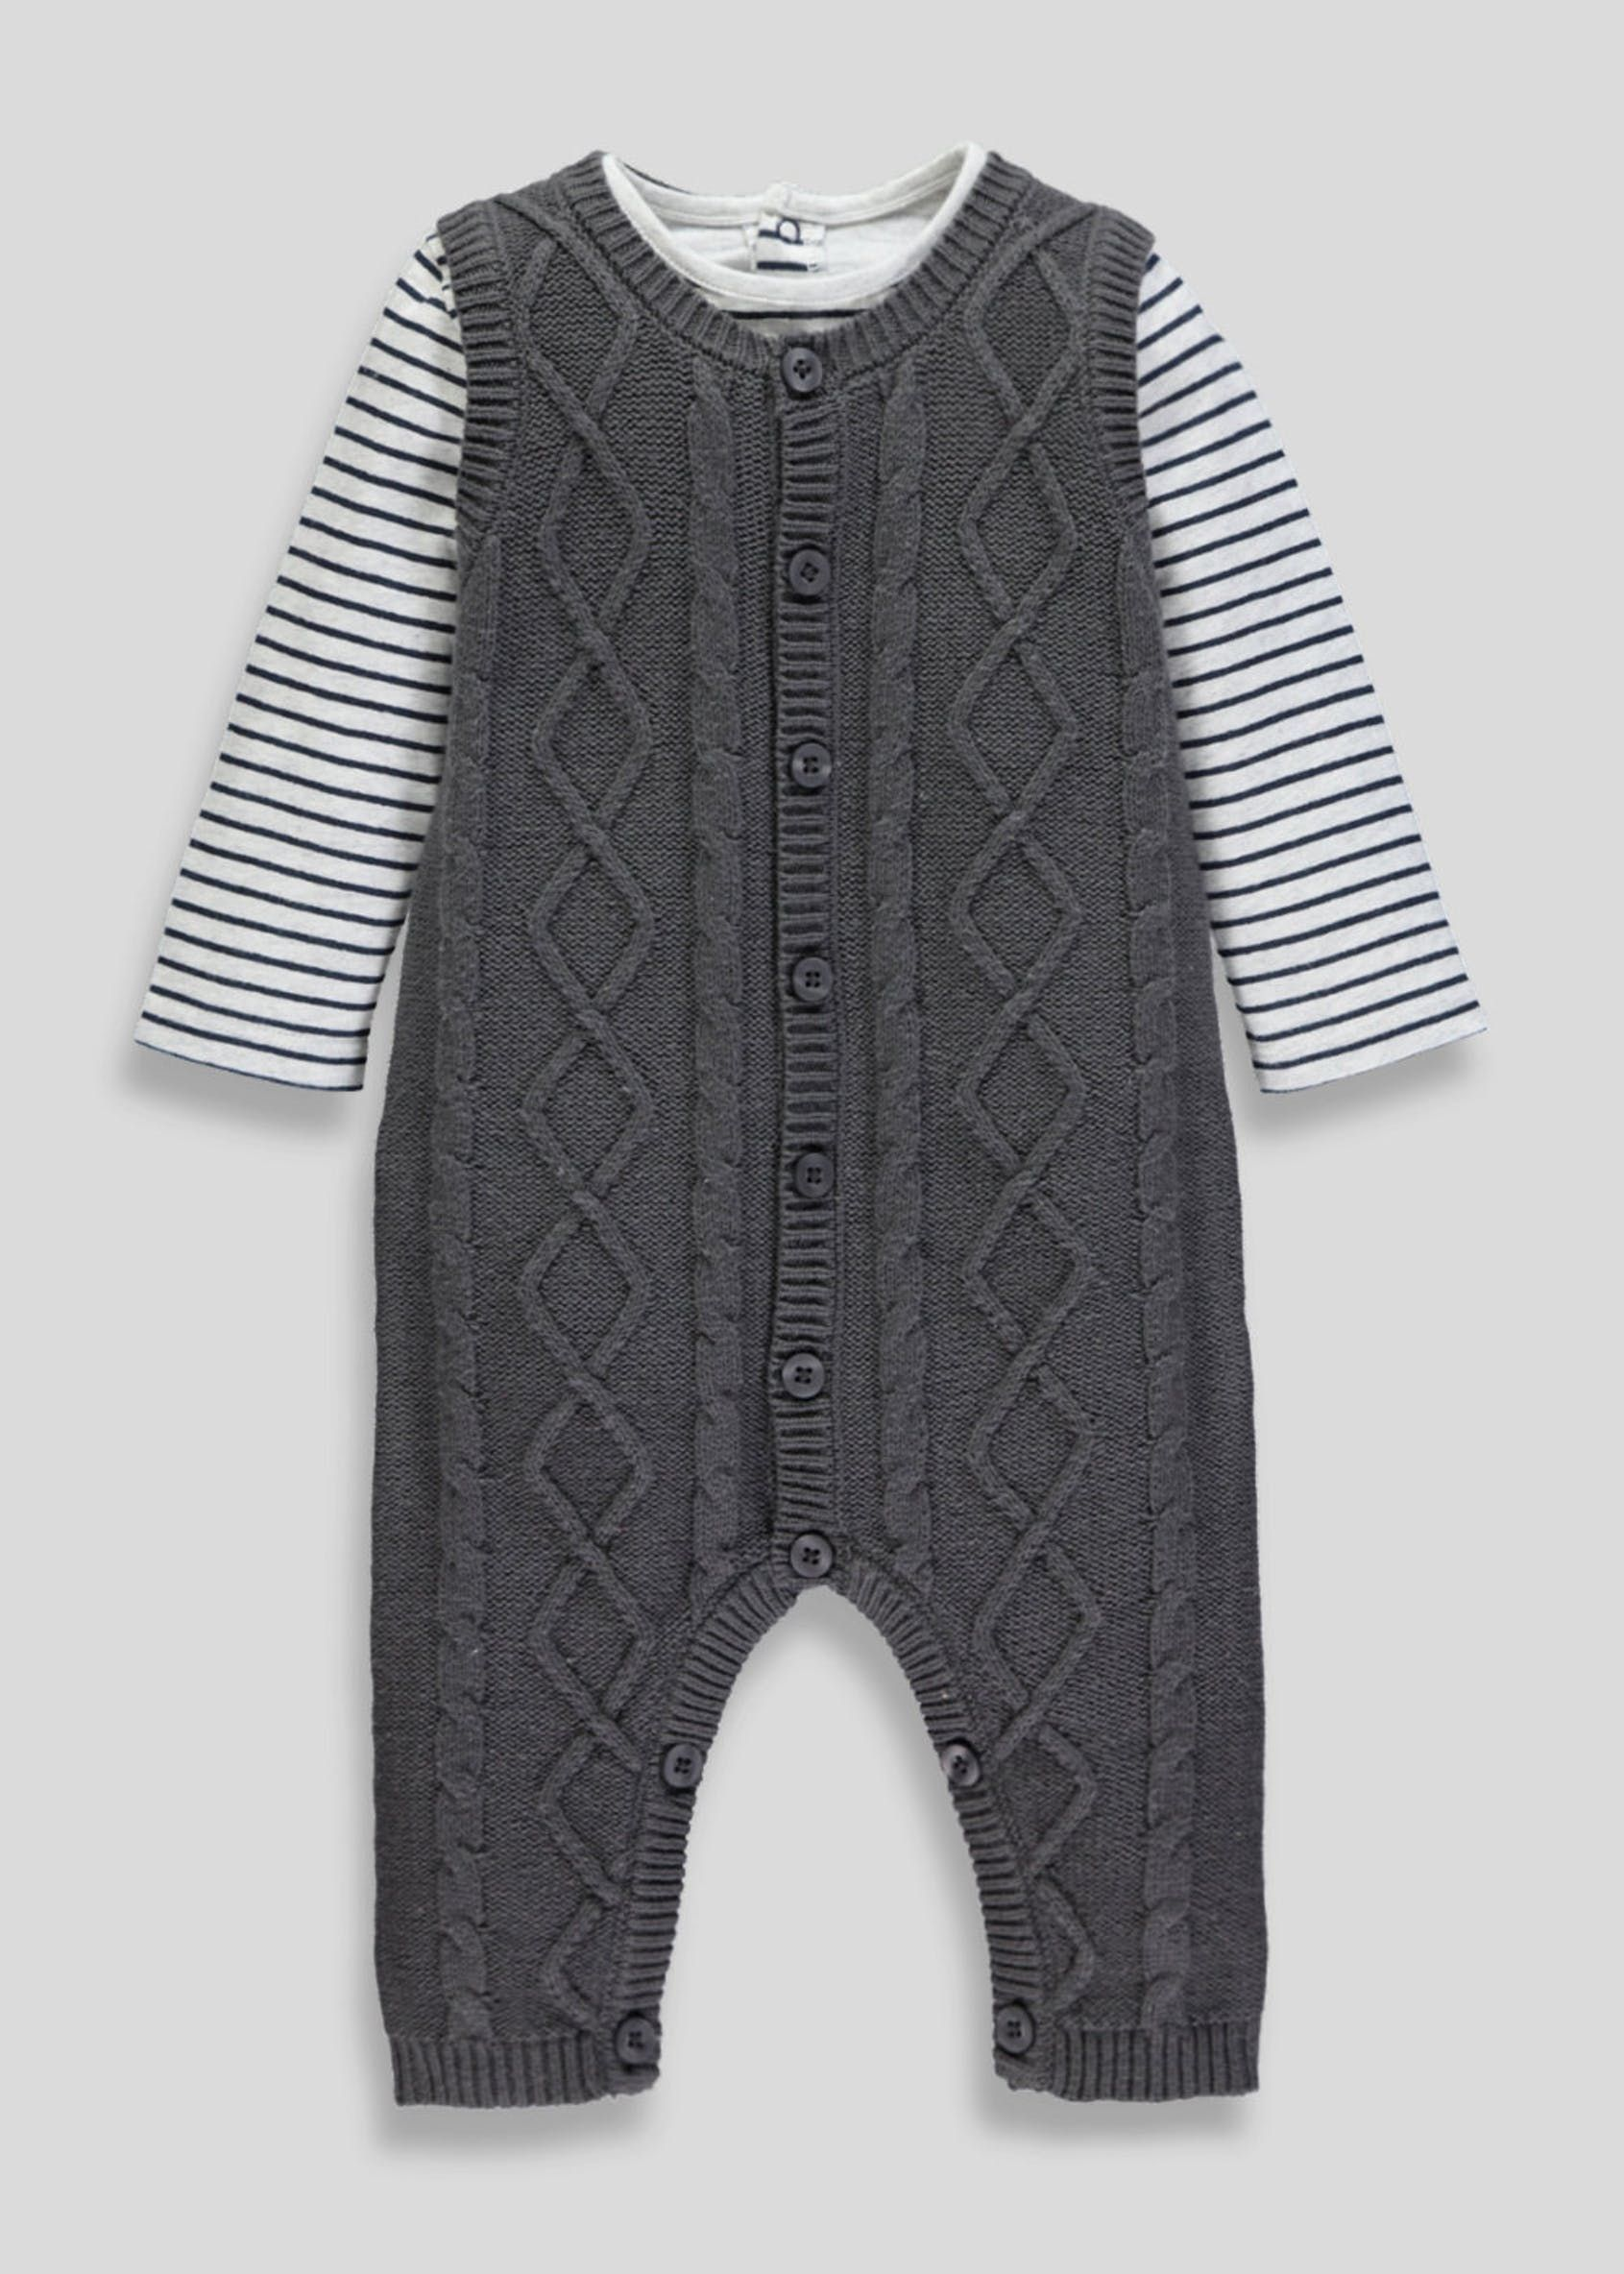 8271b200e364 Unisex Knitted Romper   T-Shirt Set (Tiny Baby-18mths)